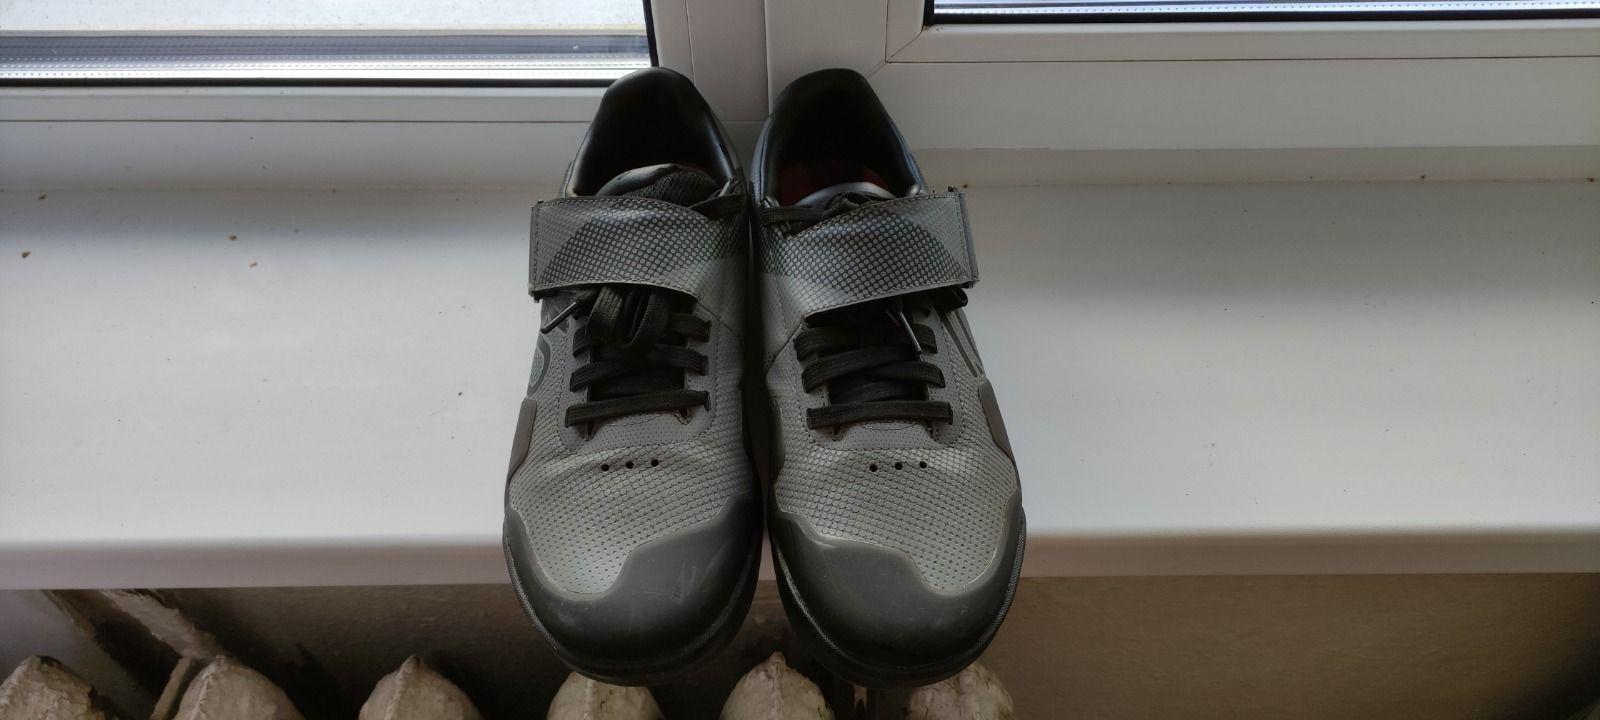 Adidas Five Ten с шипами